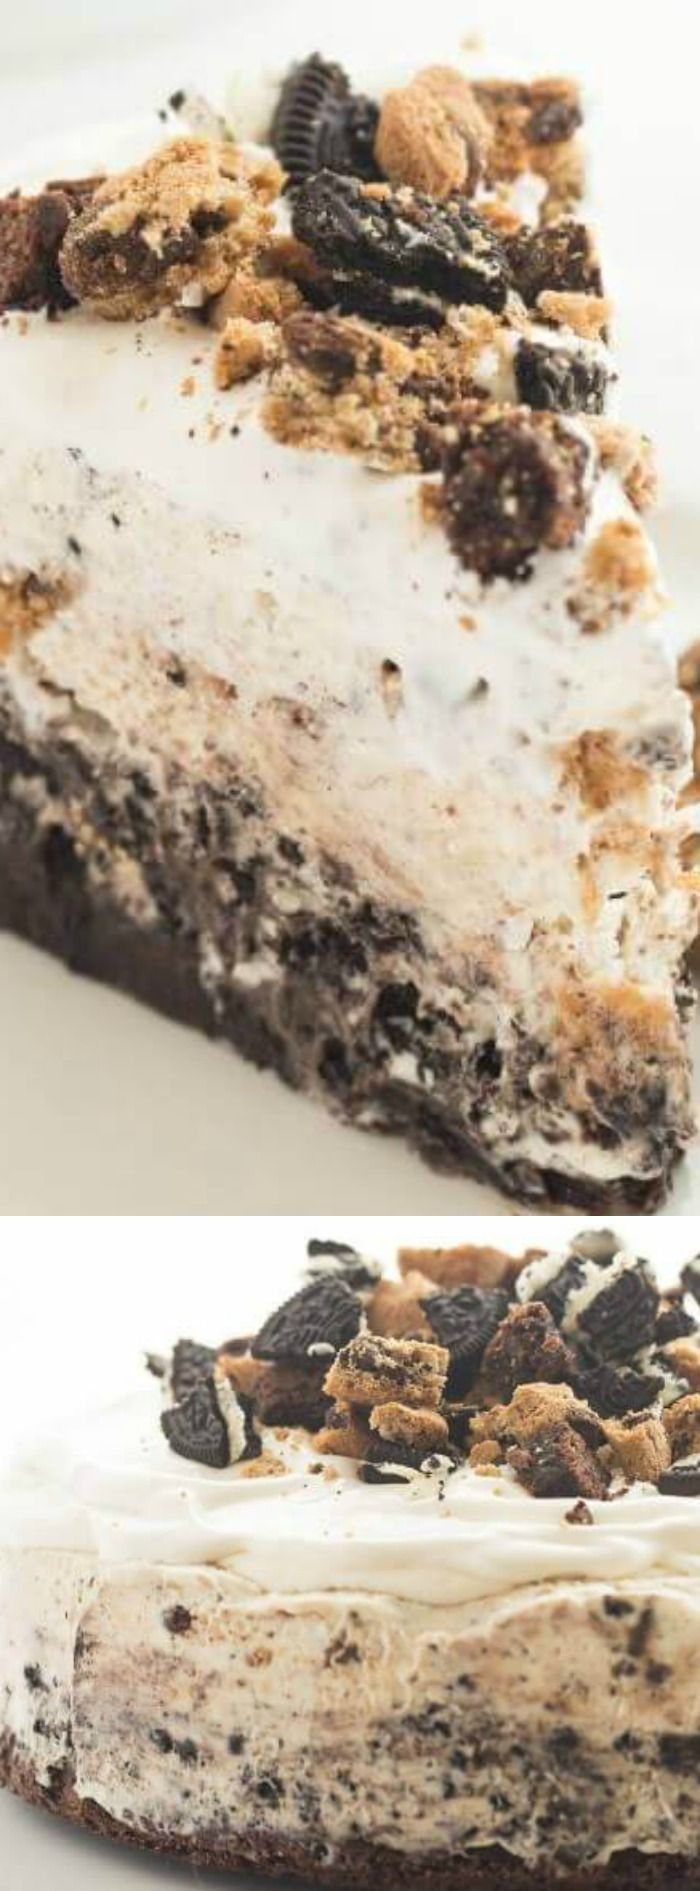 Ice cream cake recipe chocolate chip cookies